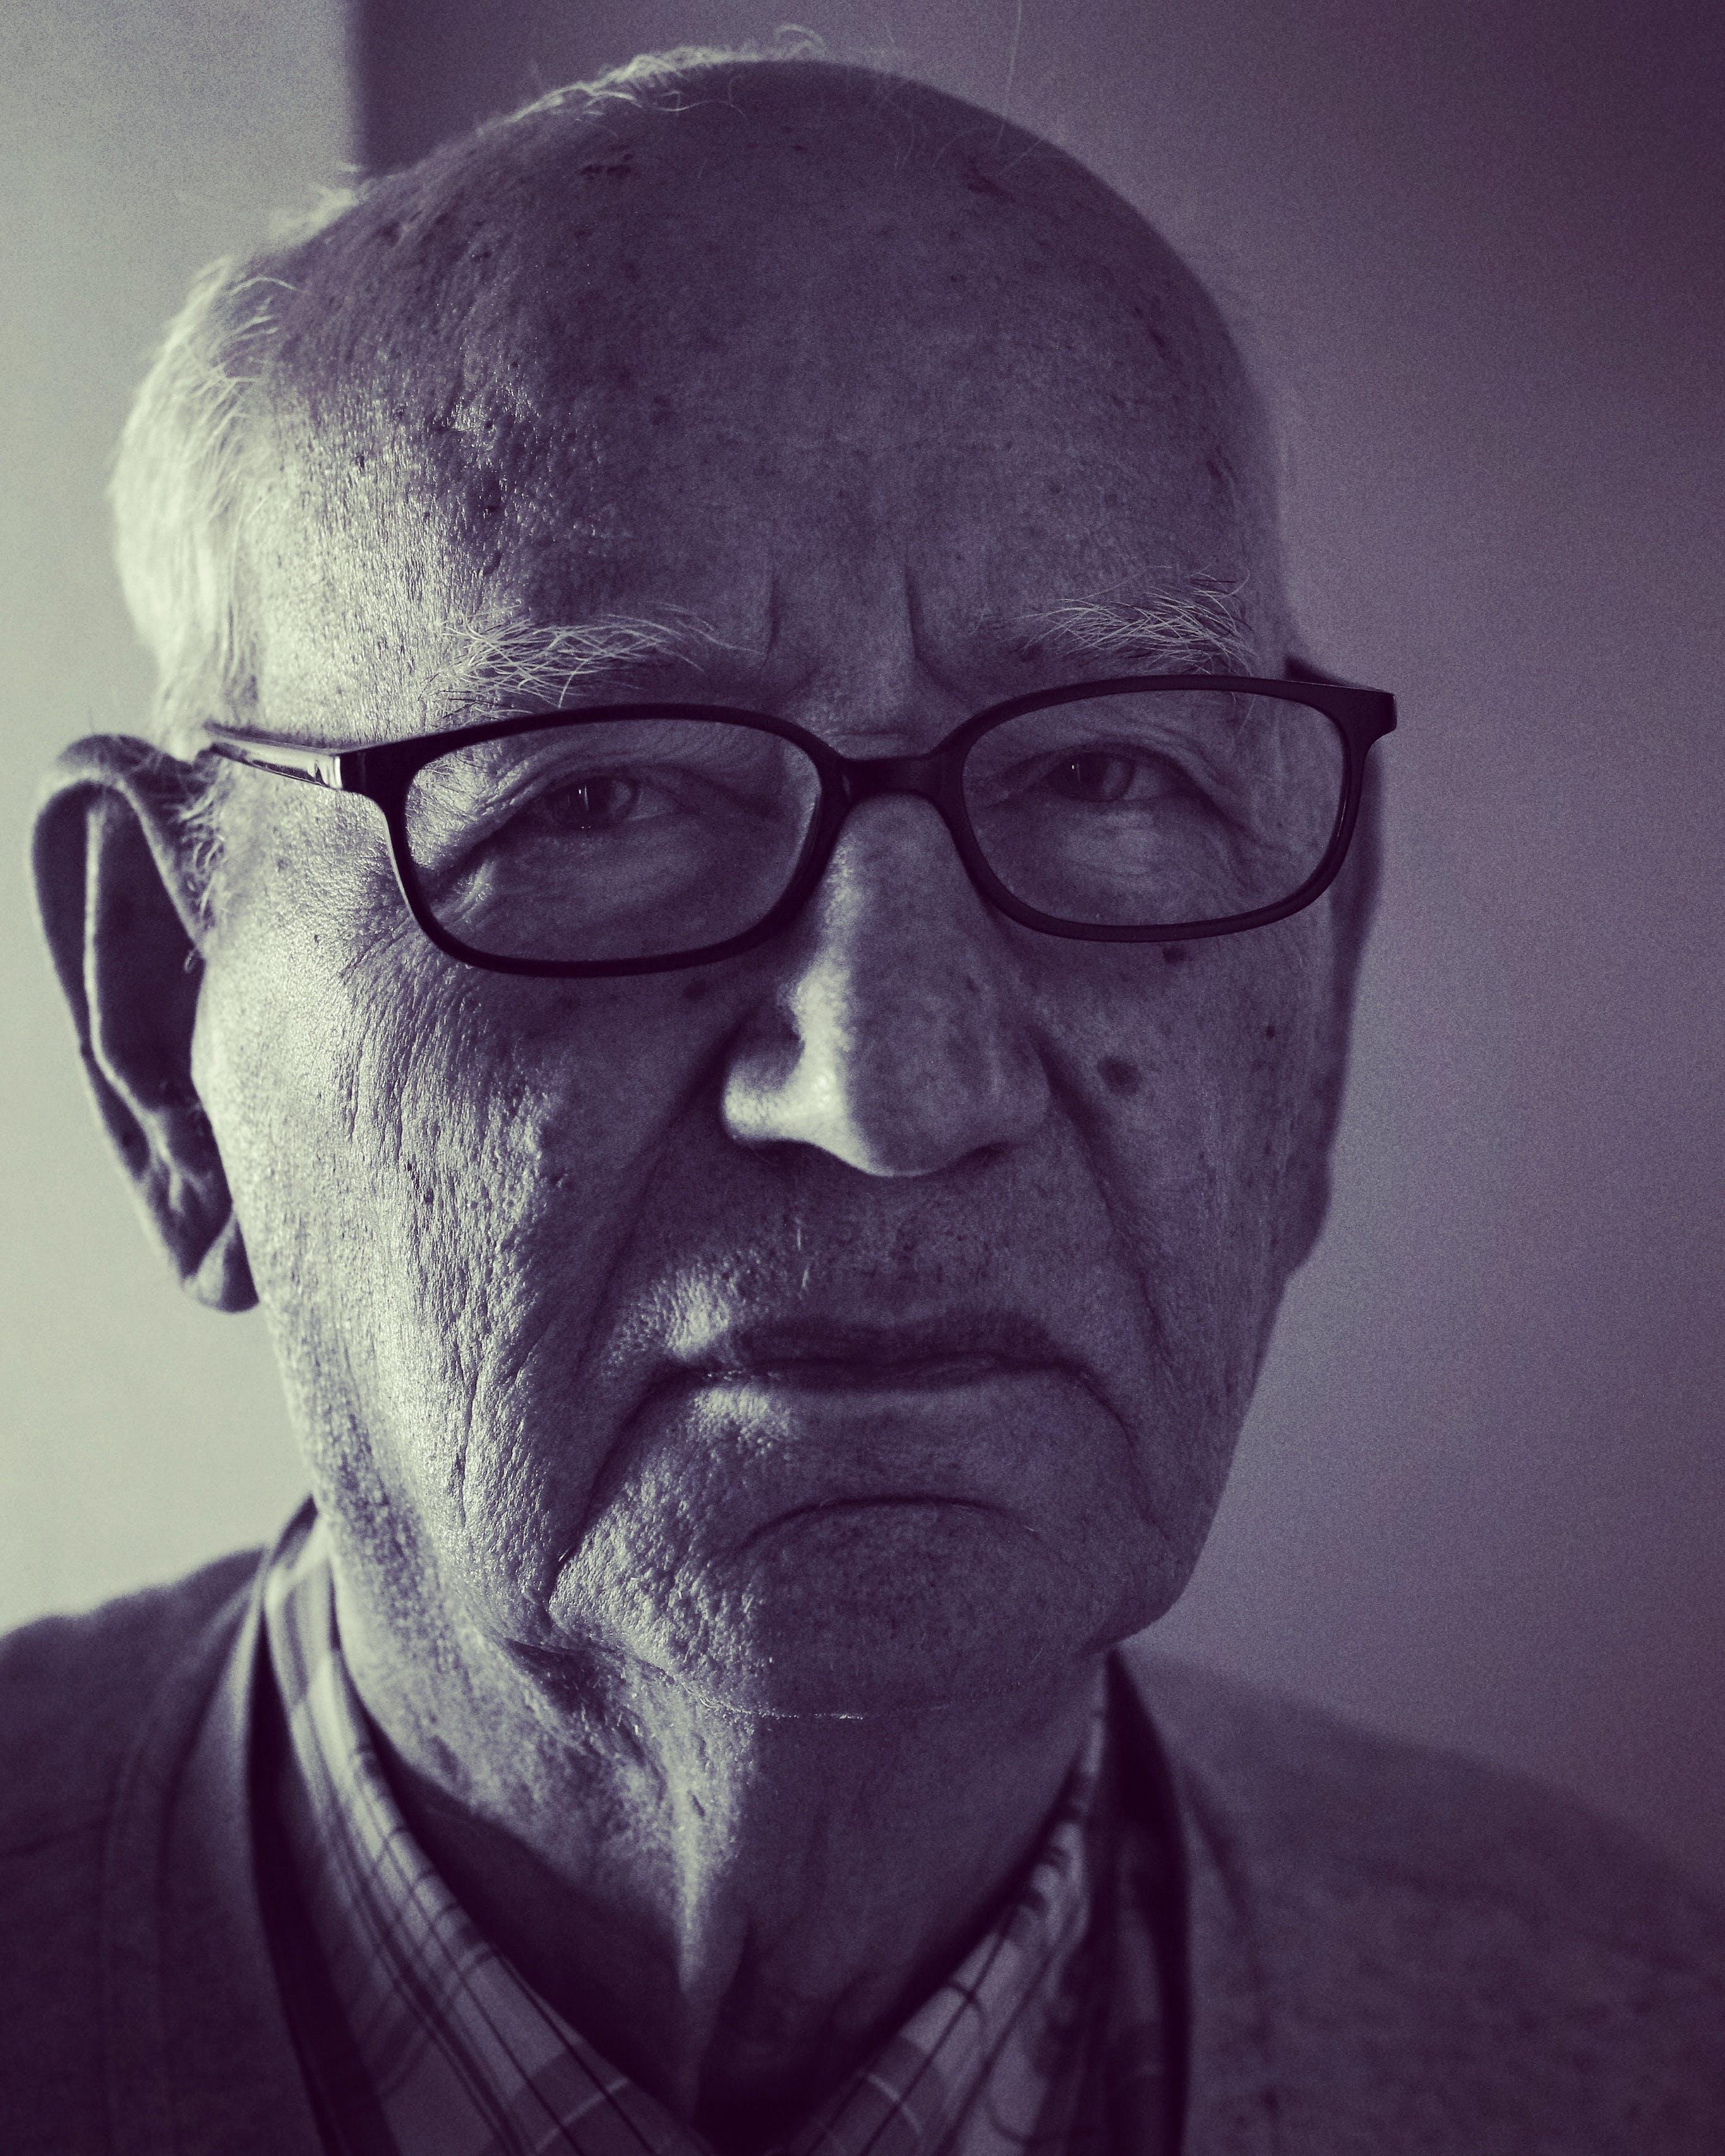 Man in Black Frame Eyeglasses